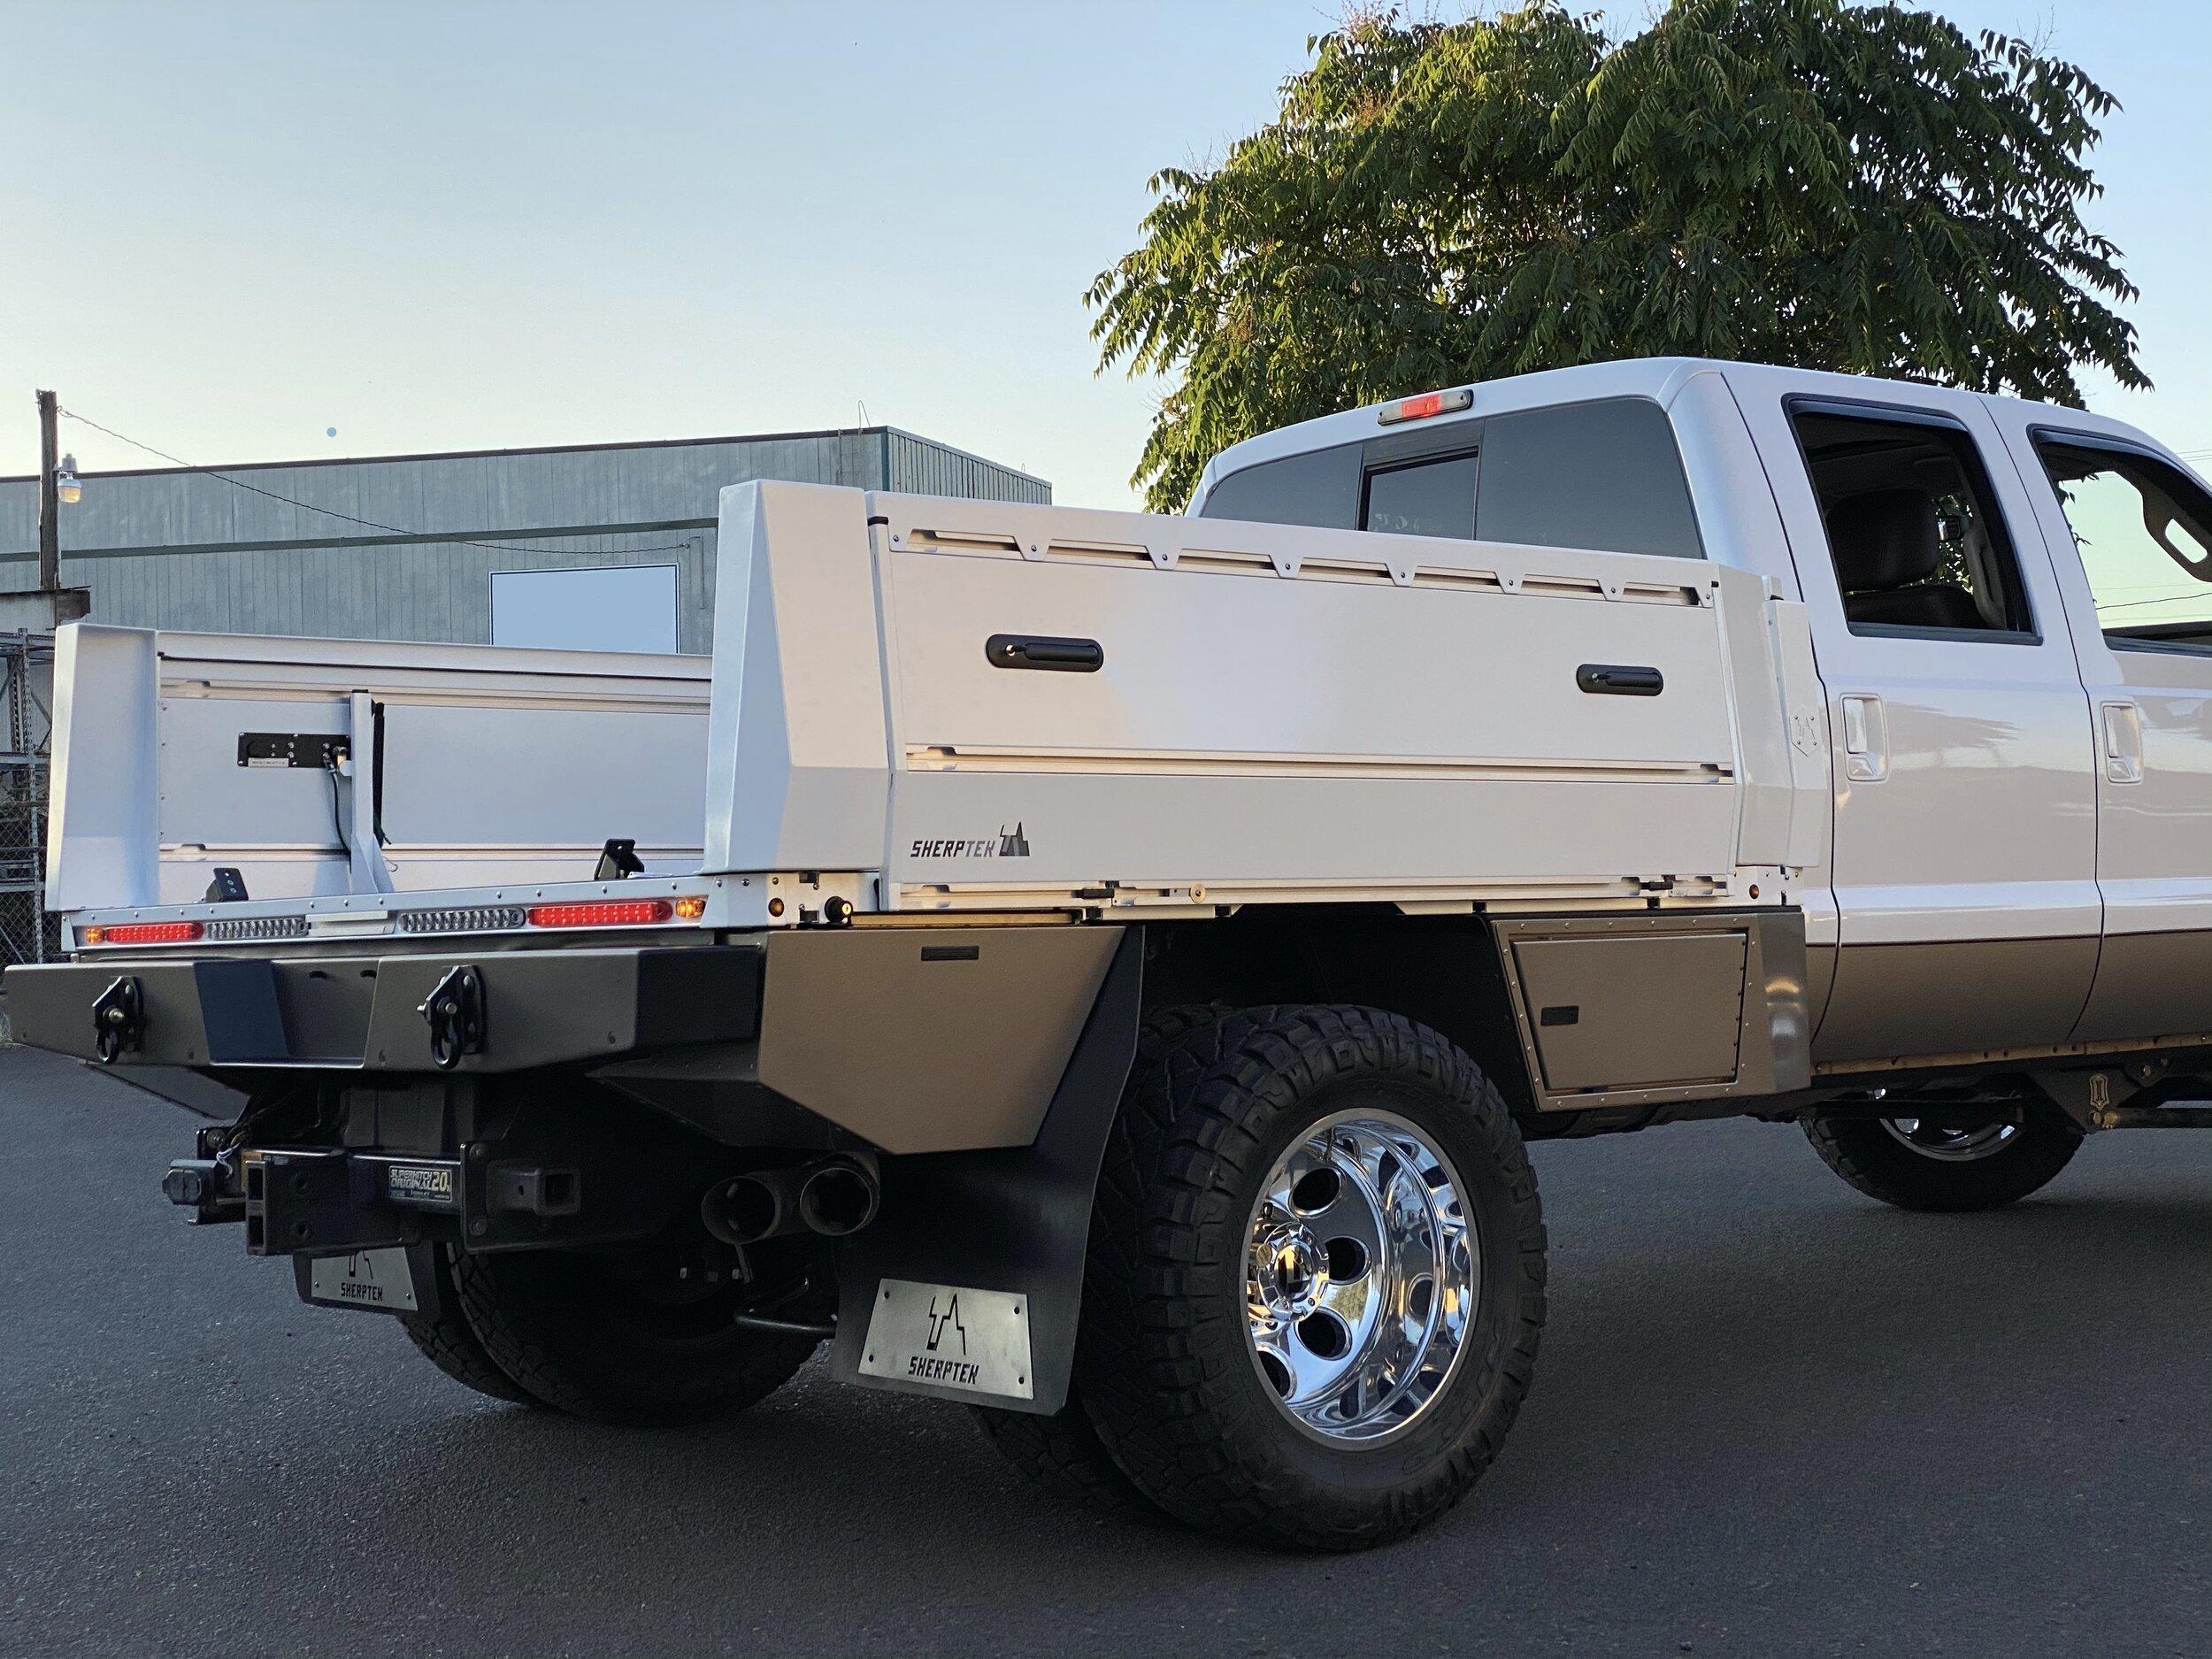 Custom Truck Beds Sherptek Sherptek Custom Gear Hauling Solutions Flatbeds Truck Decks And Truck Trays